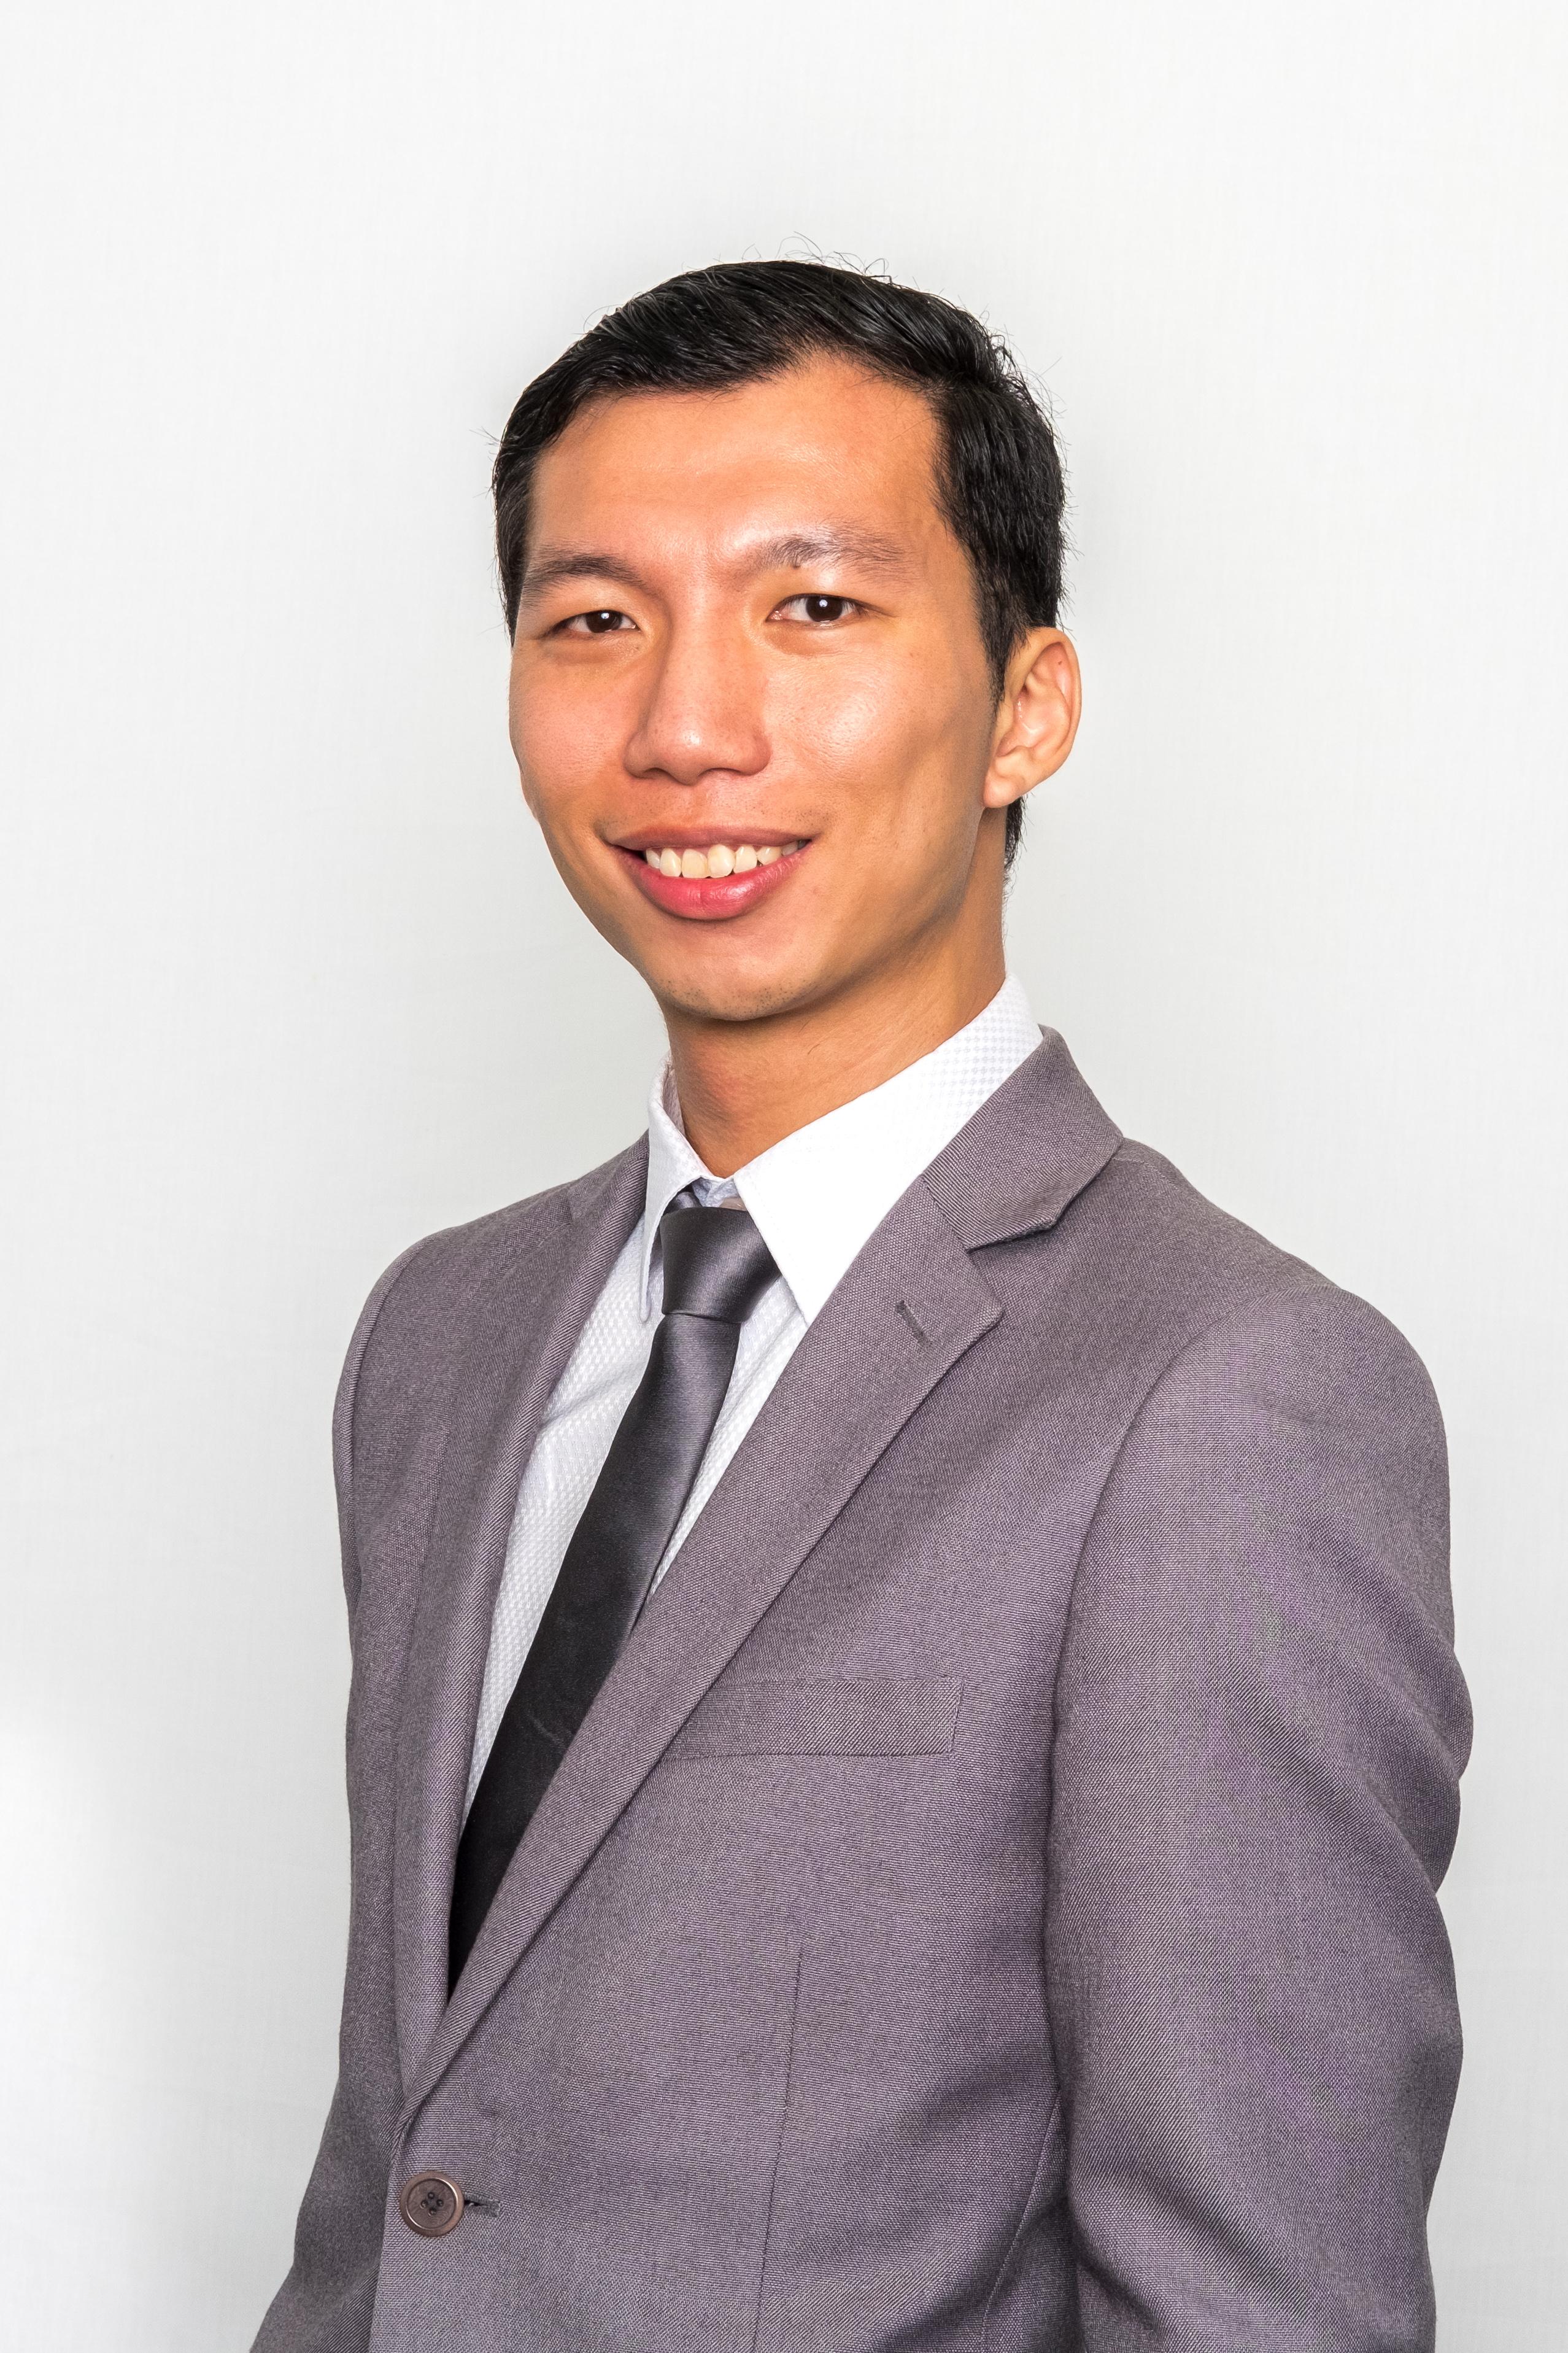 Cyrus Chii Huan Cho